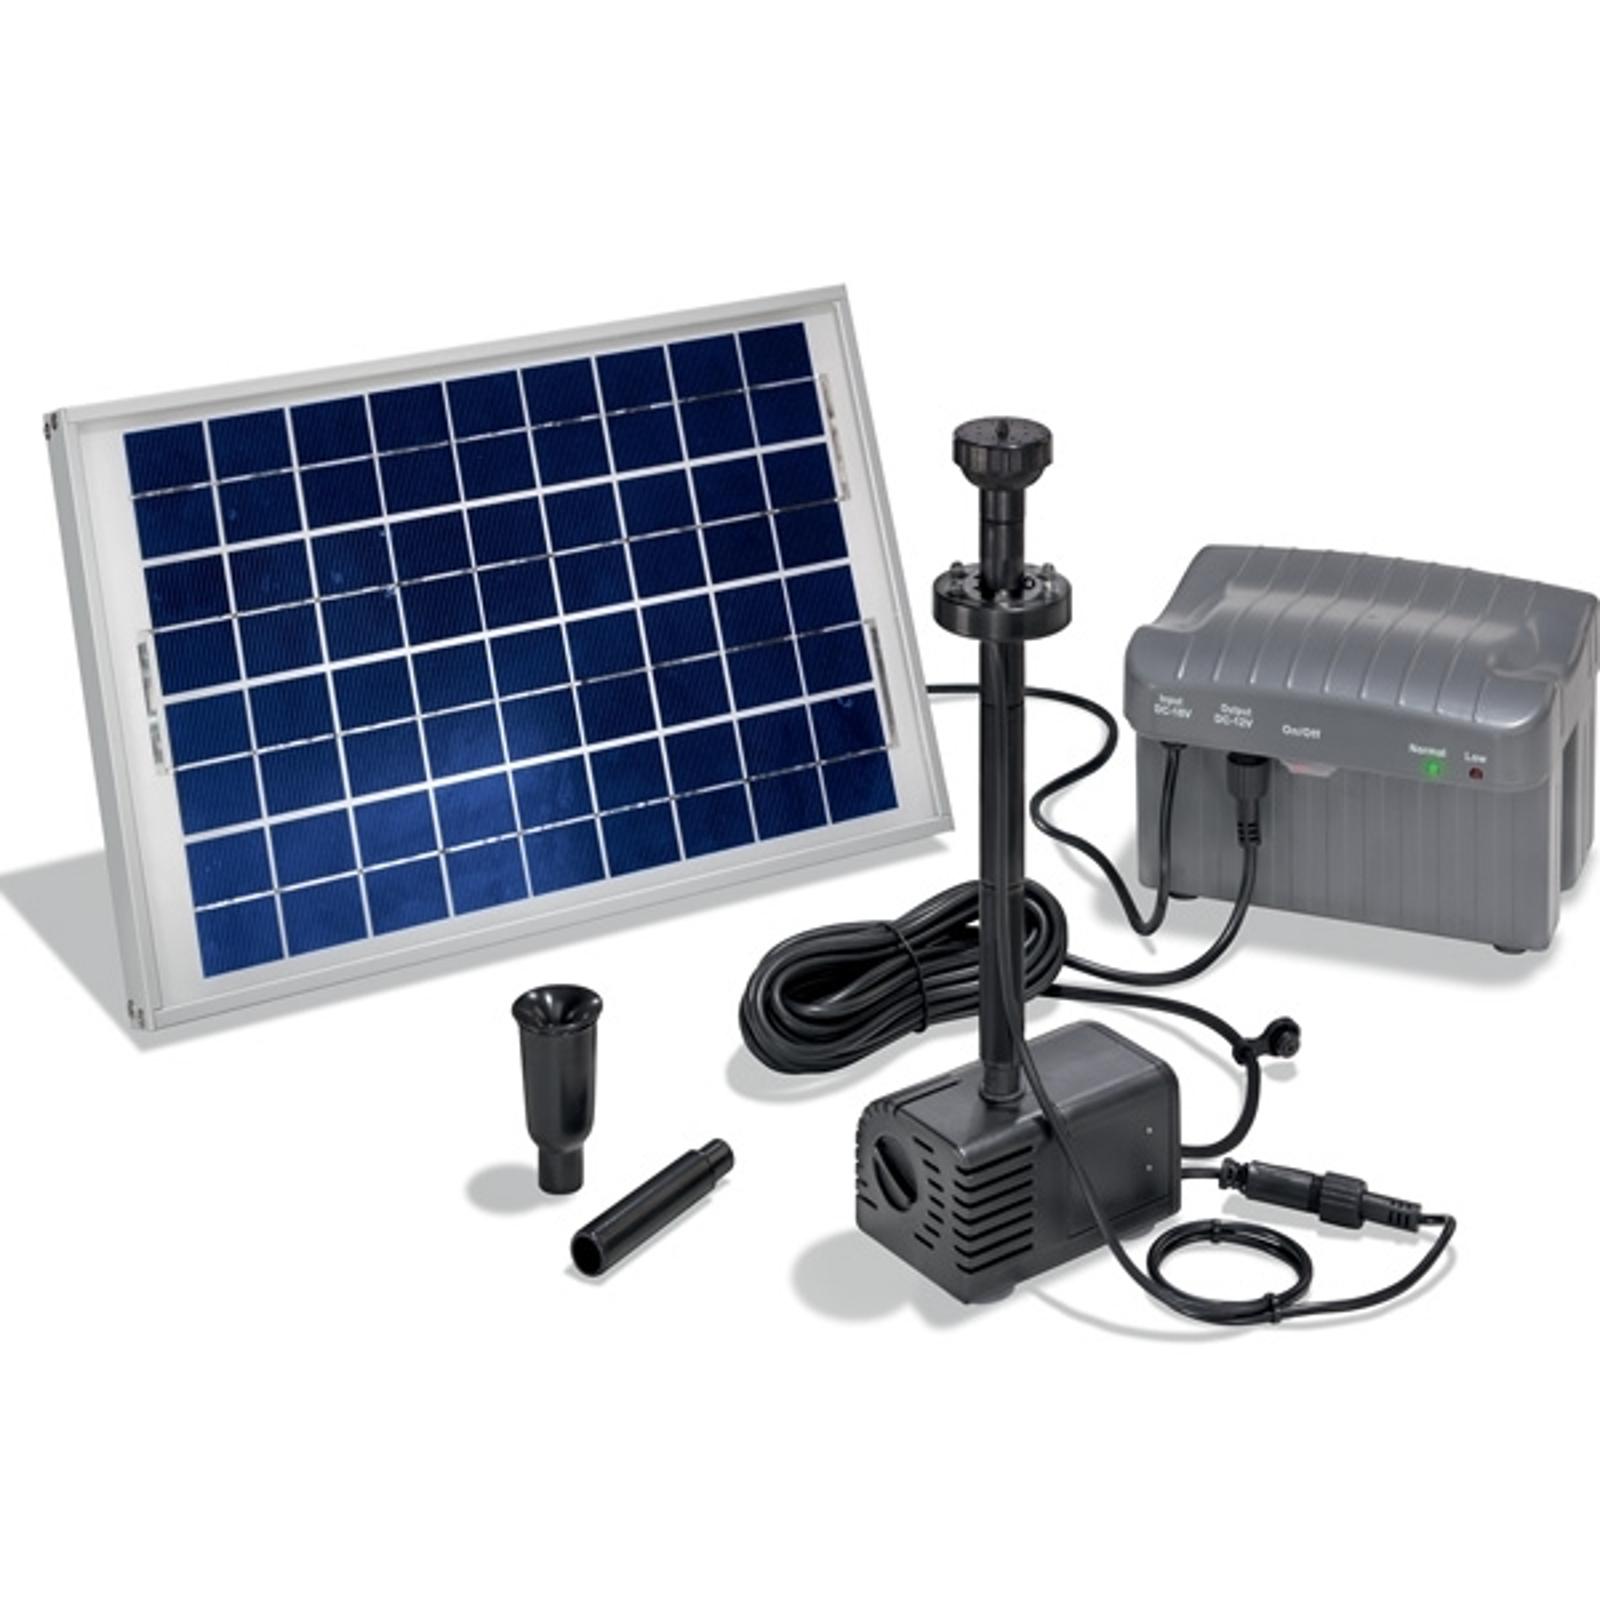 Solar Pumpensystem Siena mit LEDs